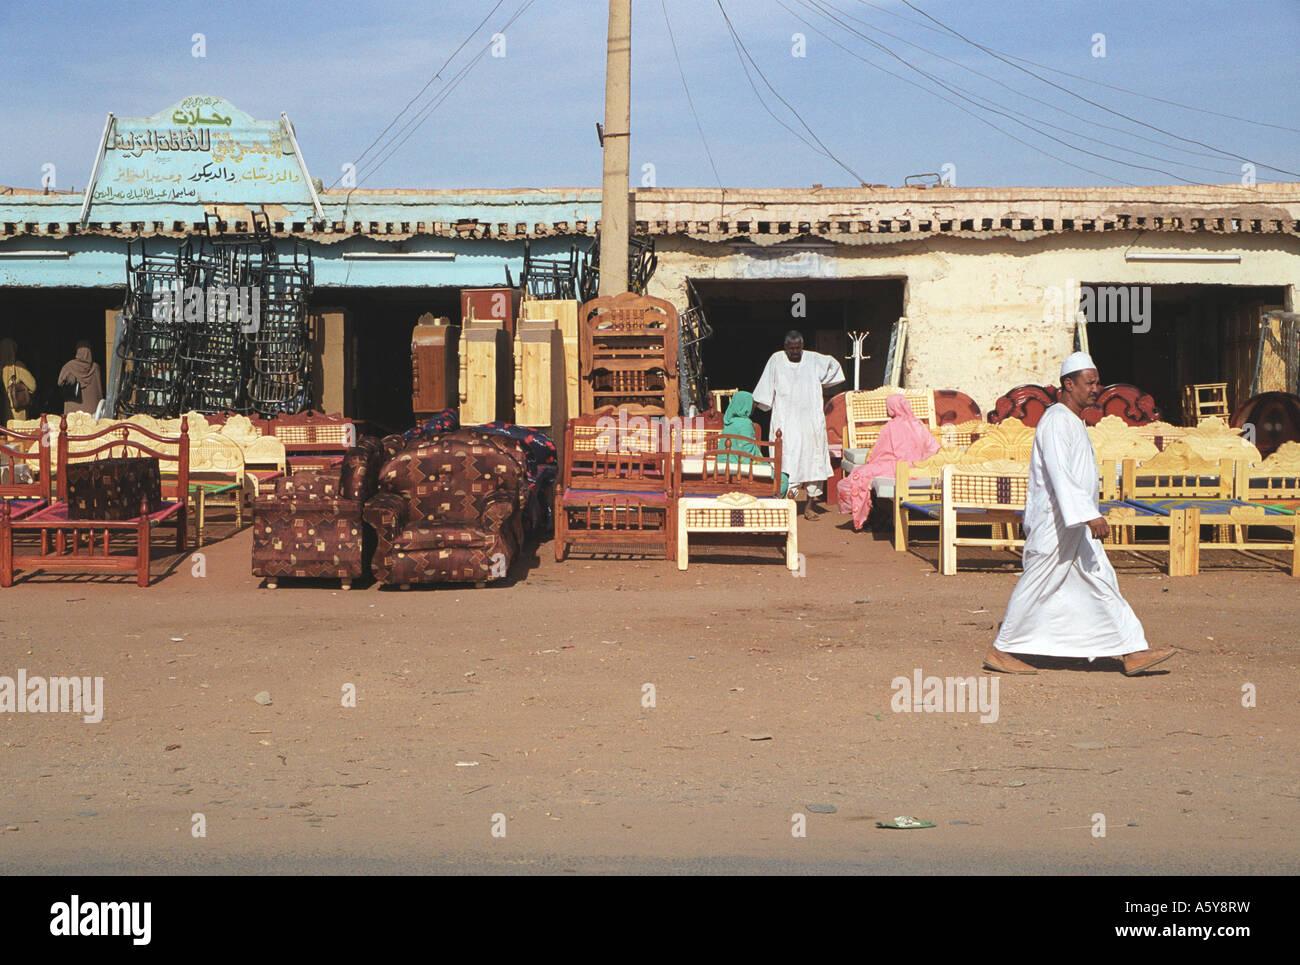 Furniture shop at Juba market, Sudan - Stock Image